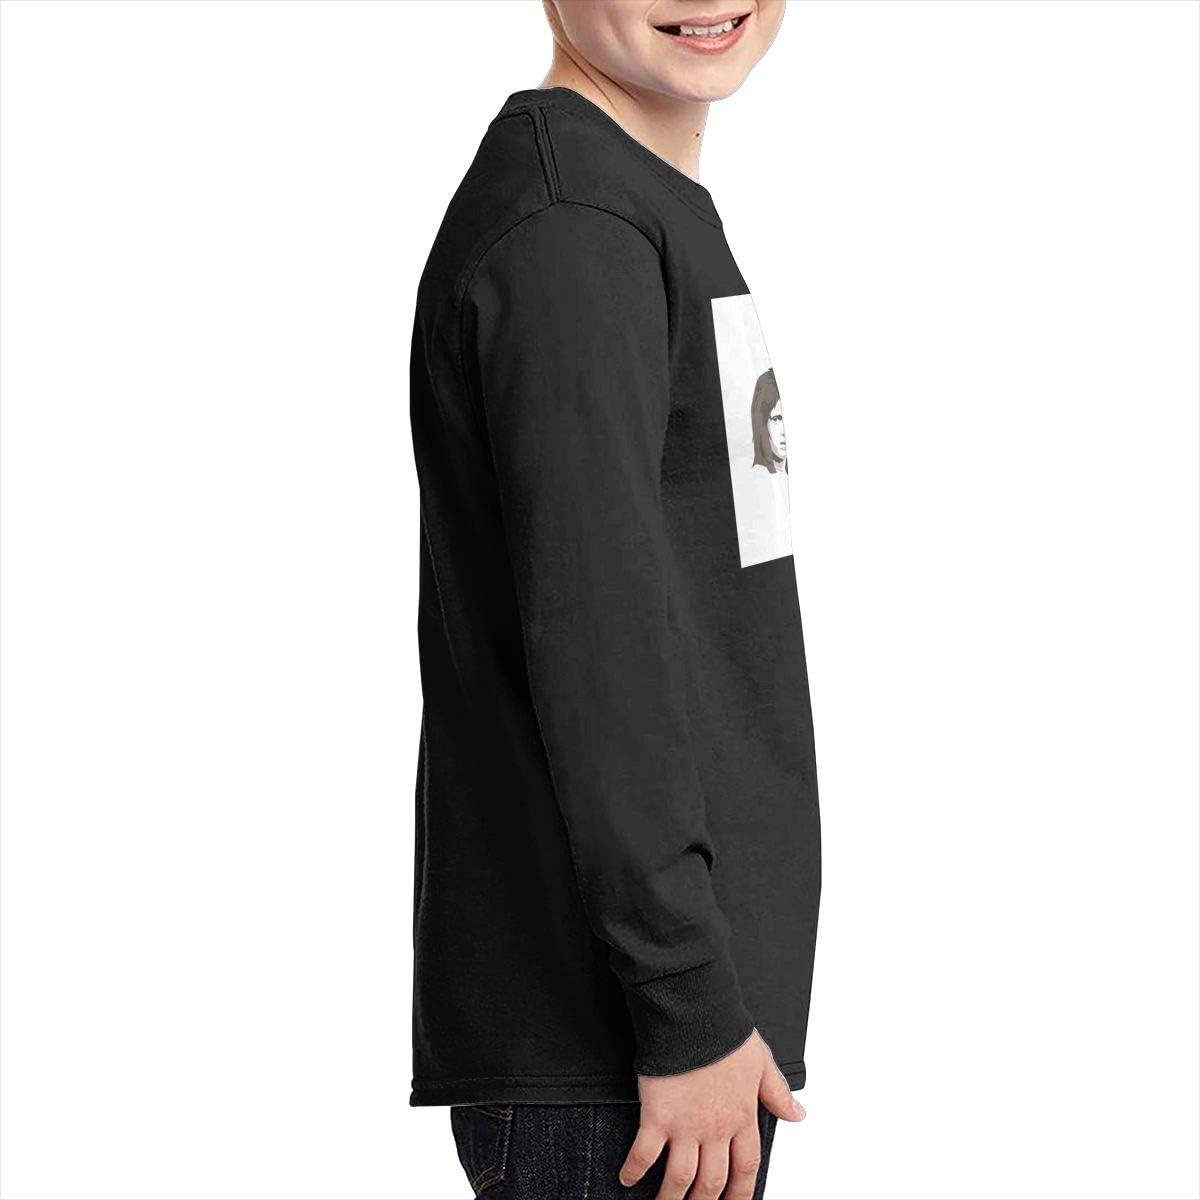 Queen Rock Band Boys Girls Long Sleeve Graphic Fashion T-Shirt